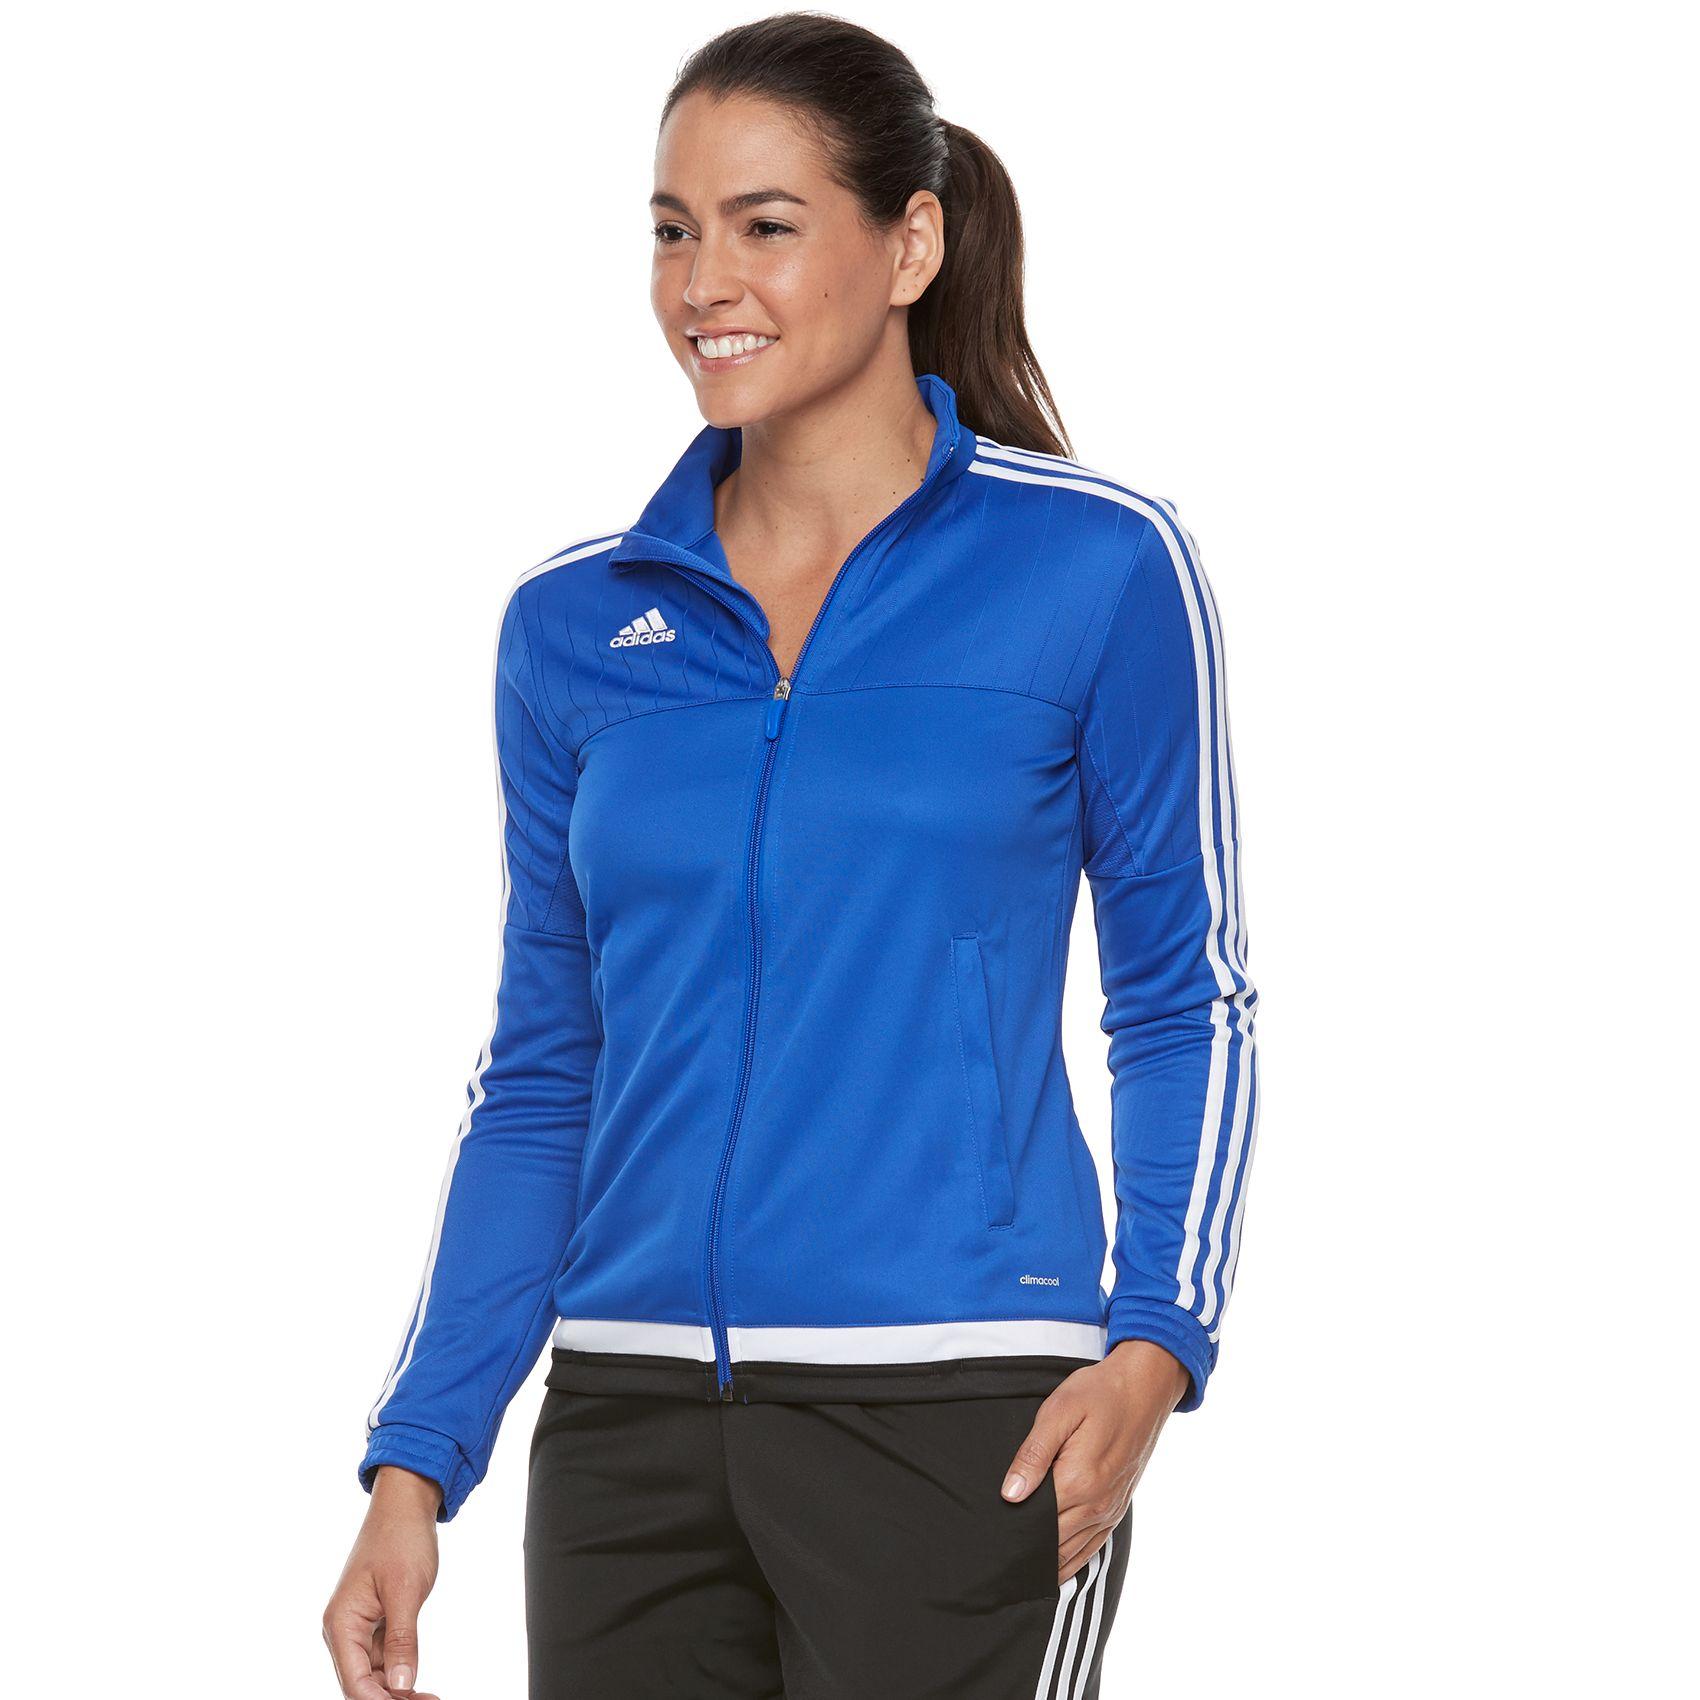 Adidas | Kohl's